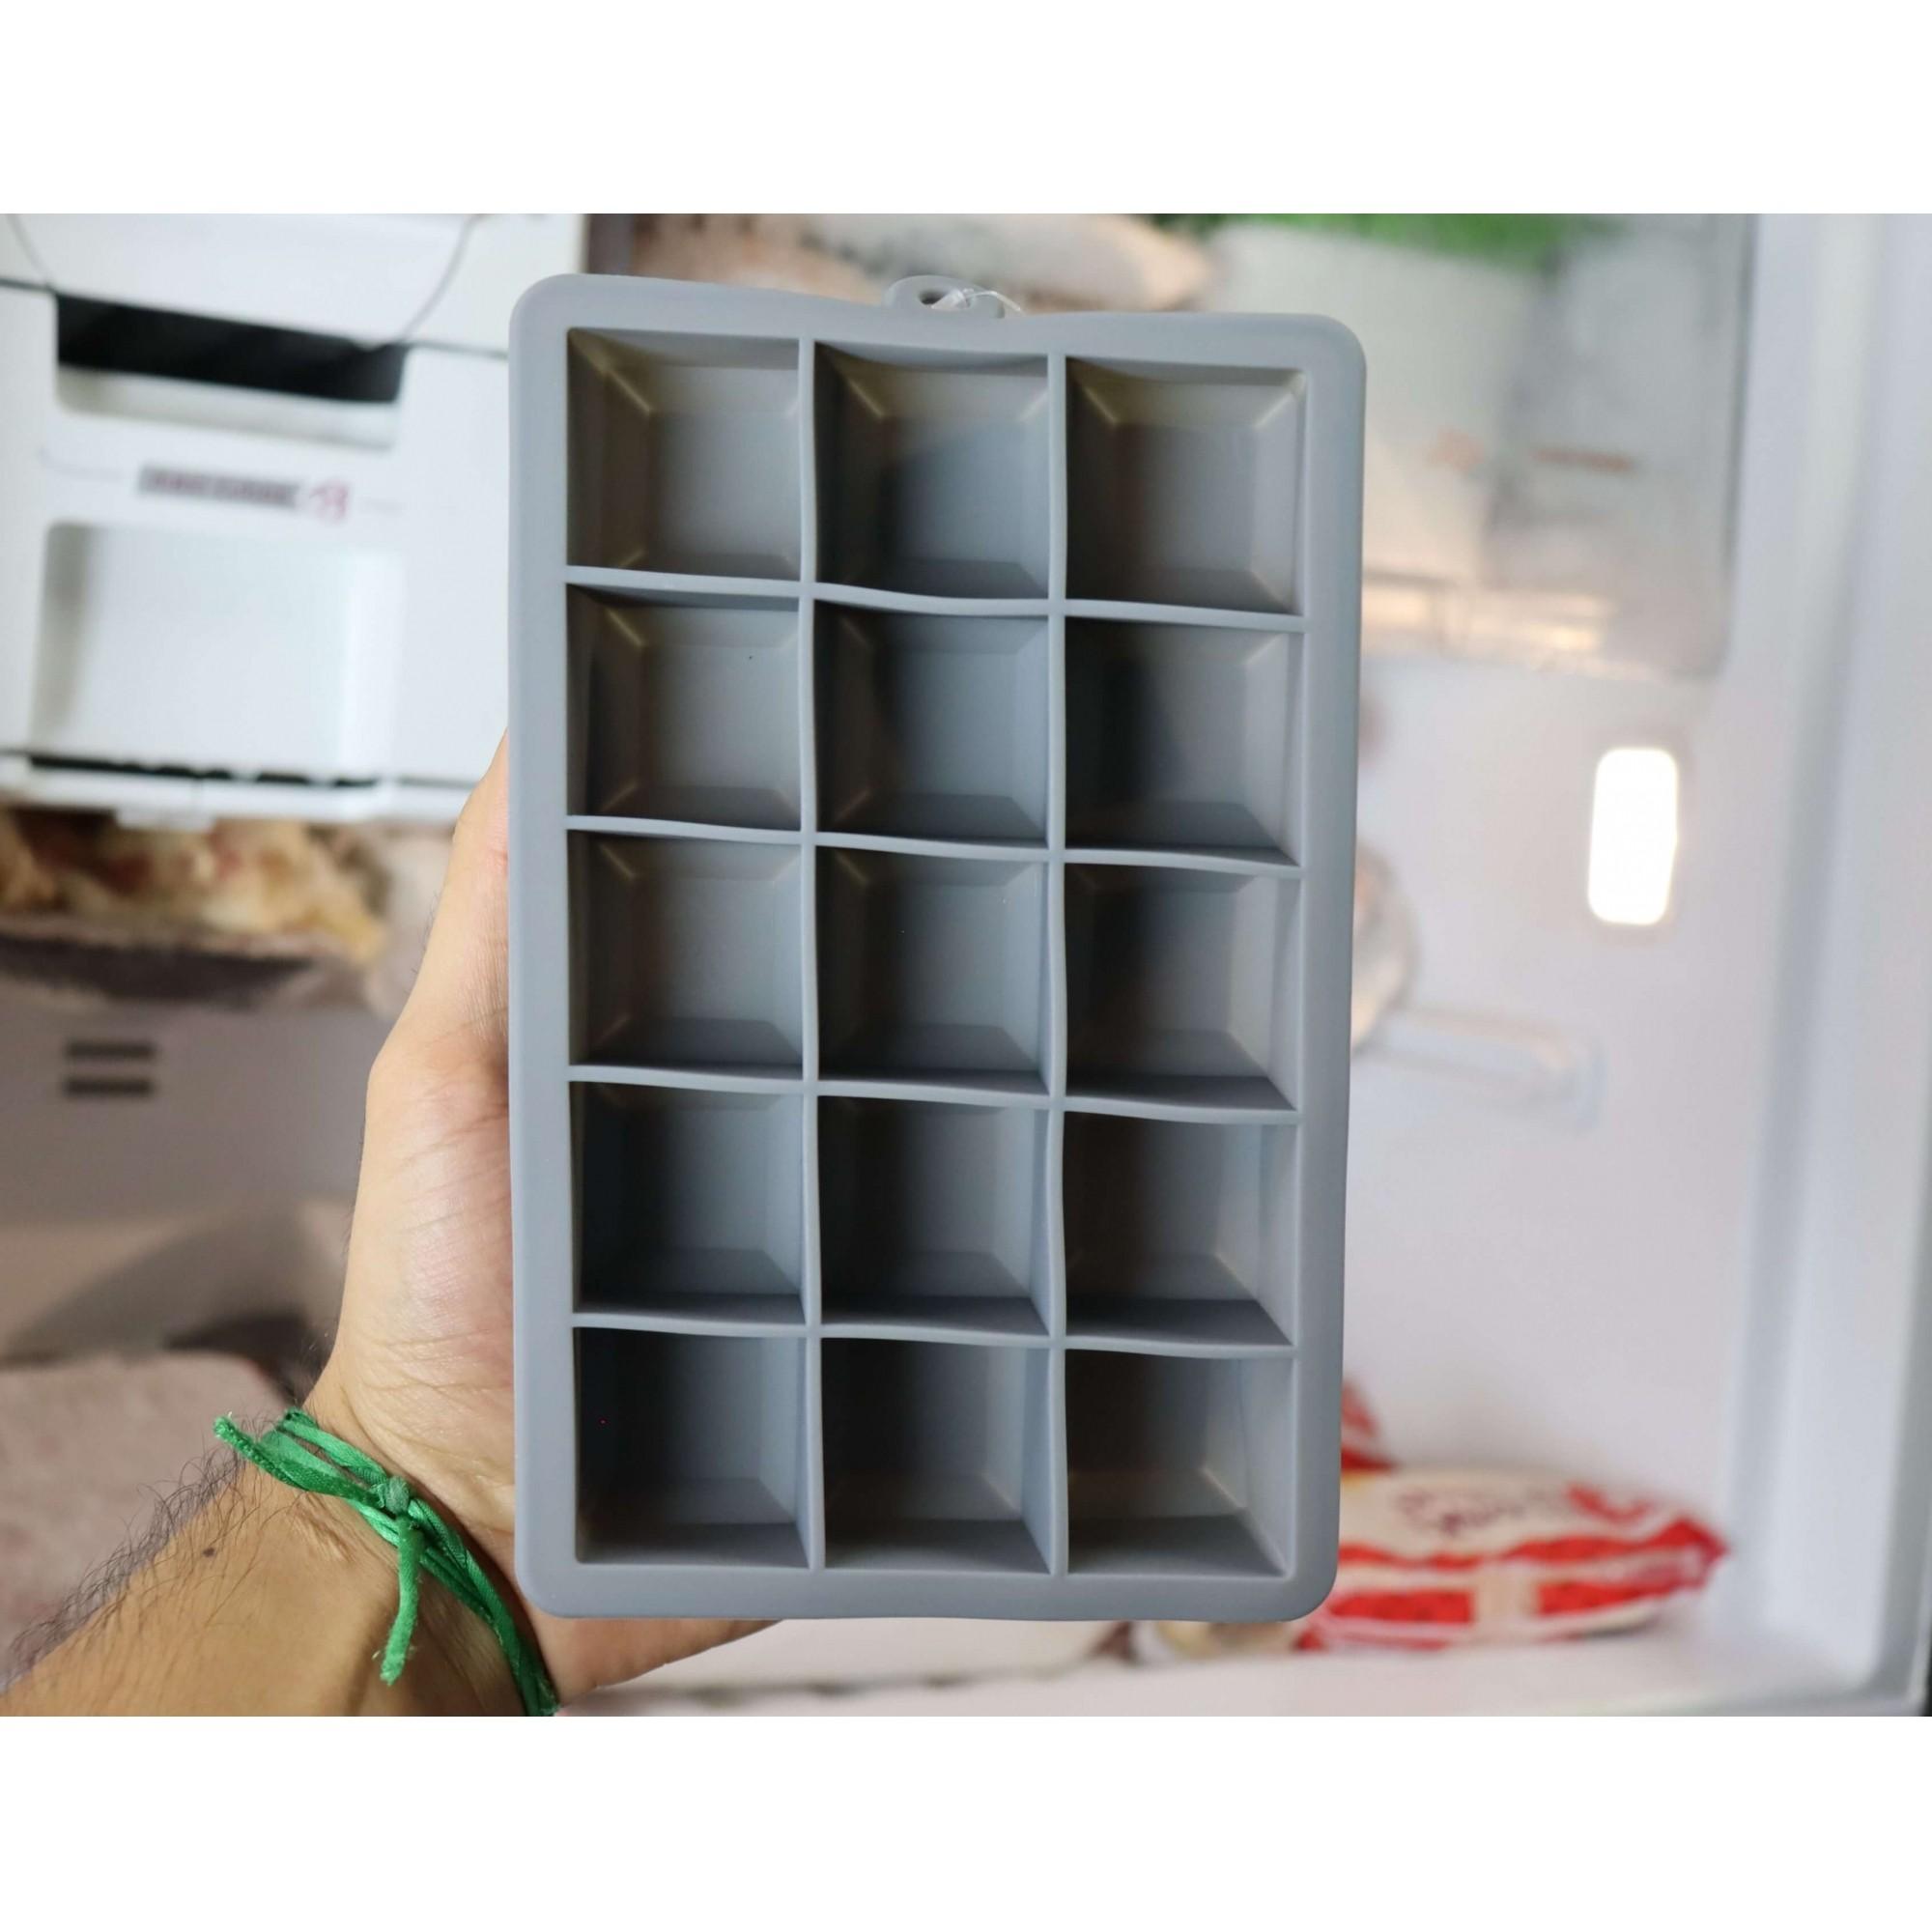 Forma de gelo papinha de silicone 15 cubos livre de bpa cinza